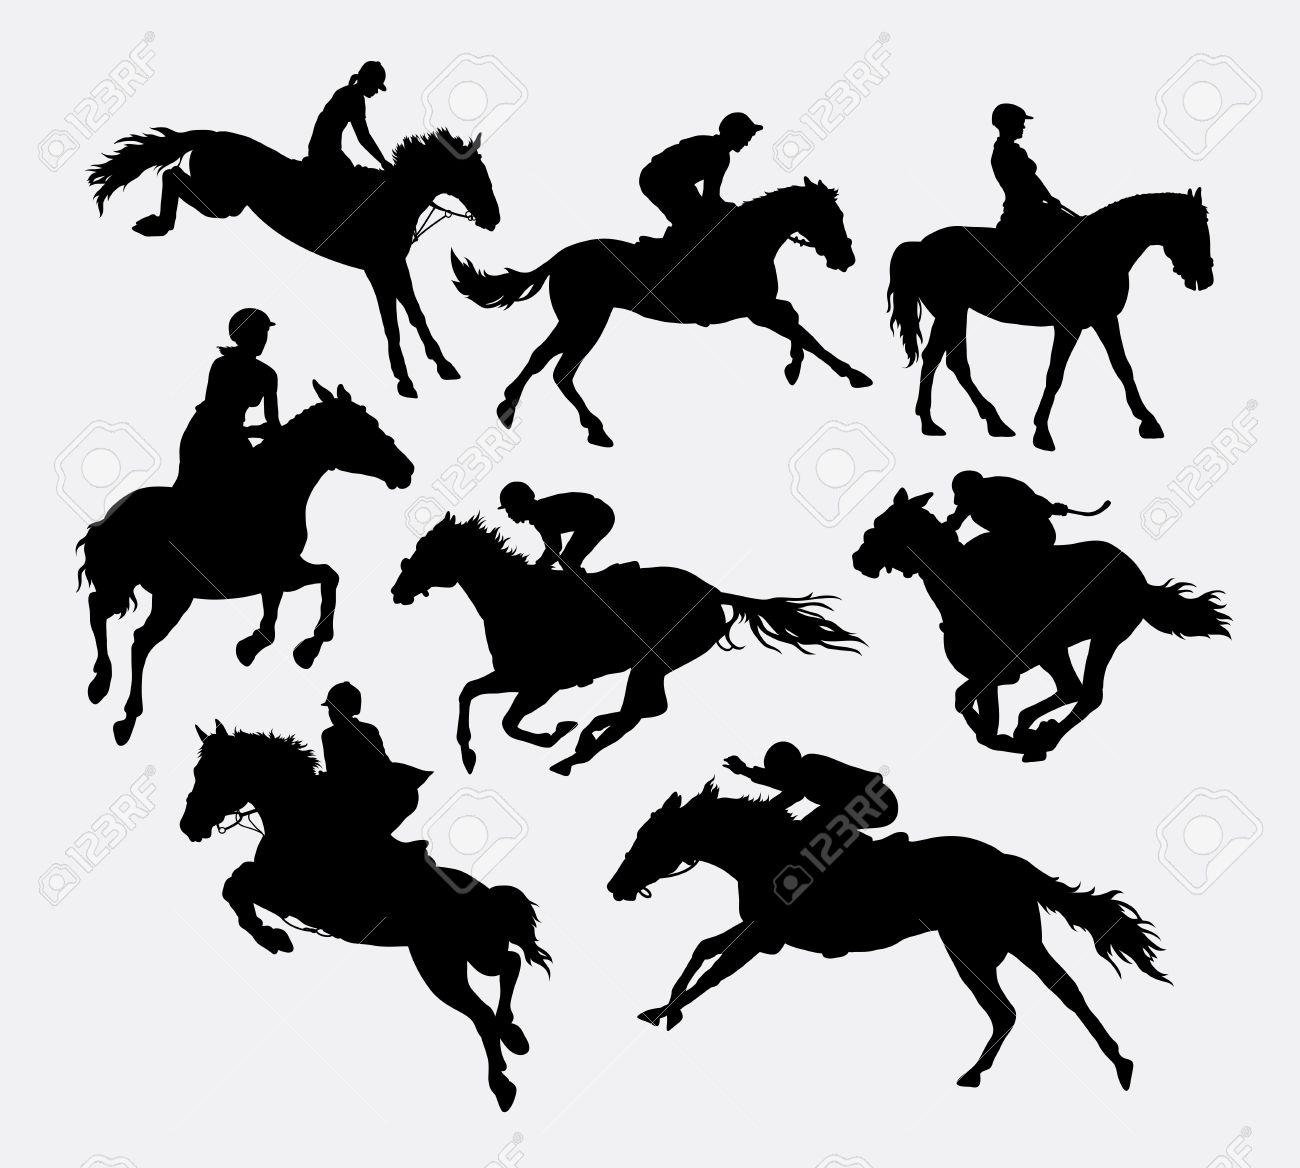 Jockey Riding Horse Silhouettes Good Use For Symbol Logo Web Icon Mascot